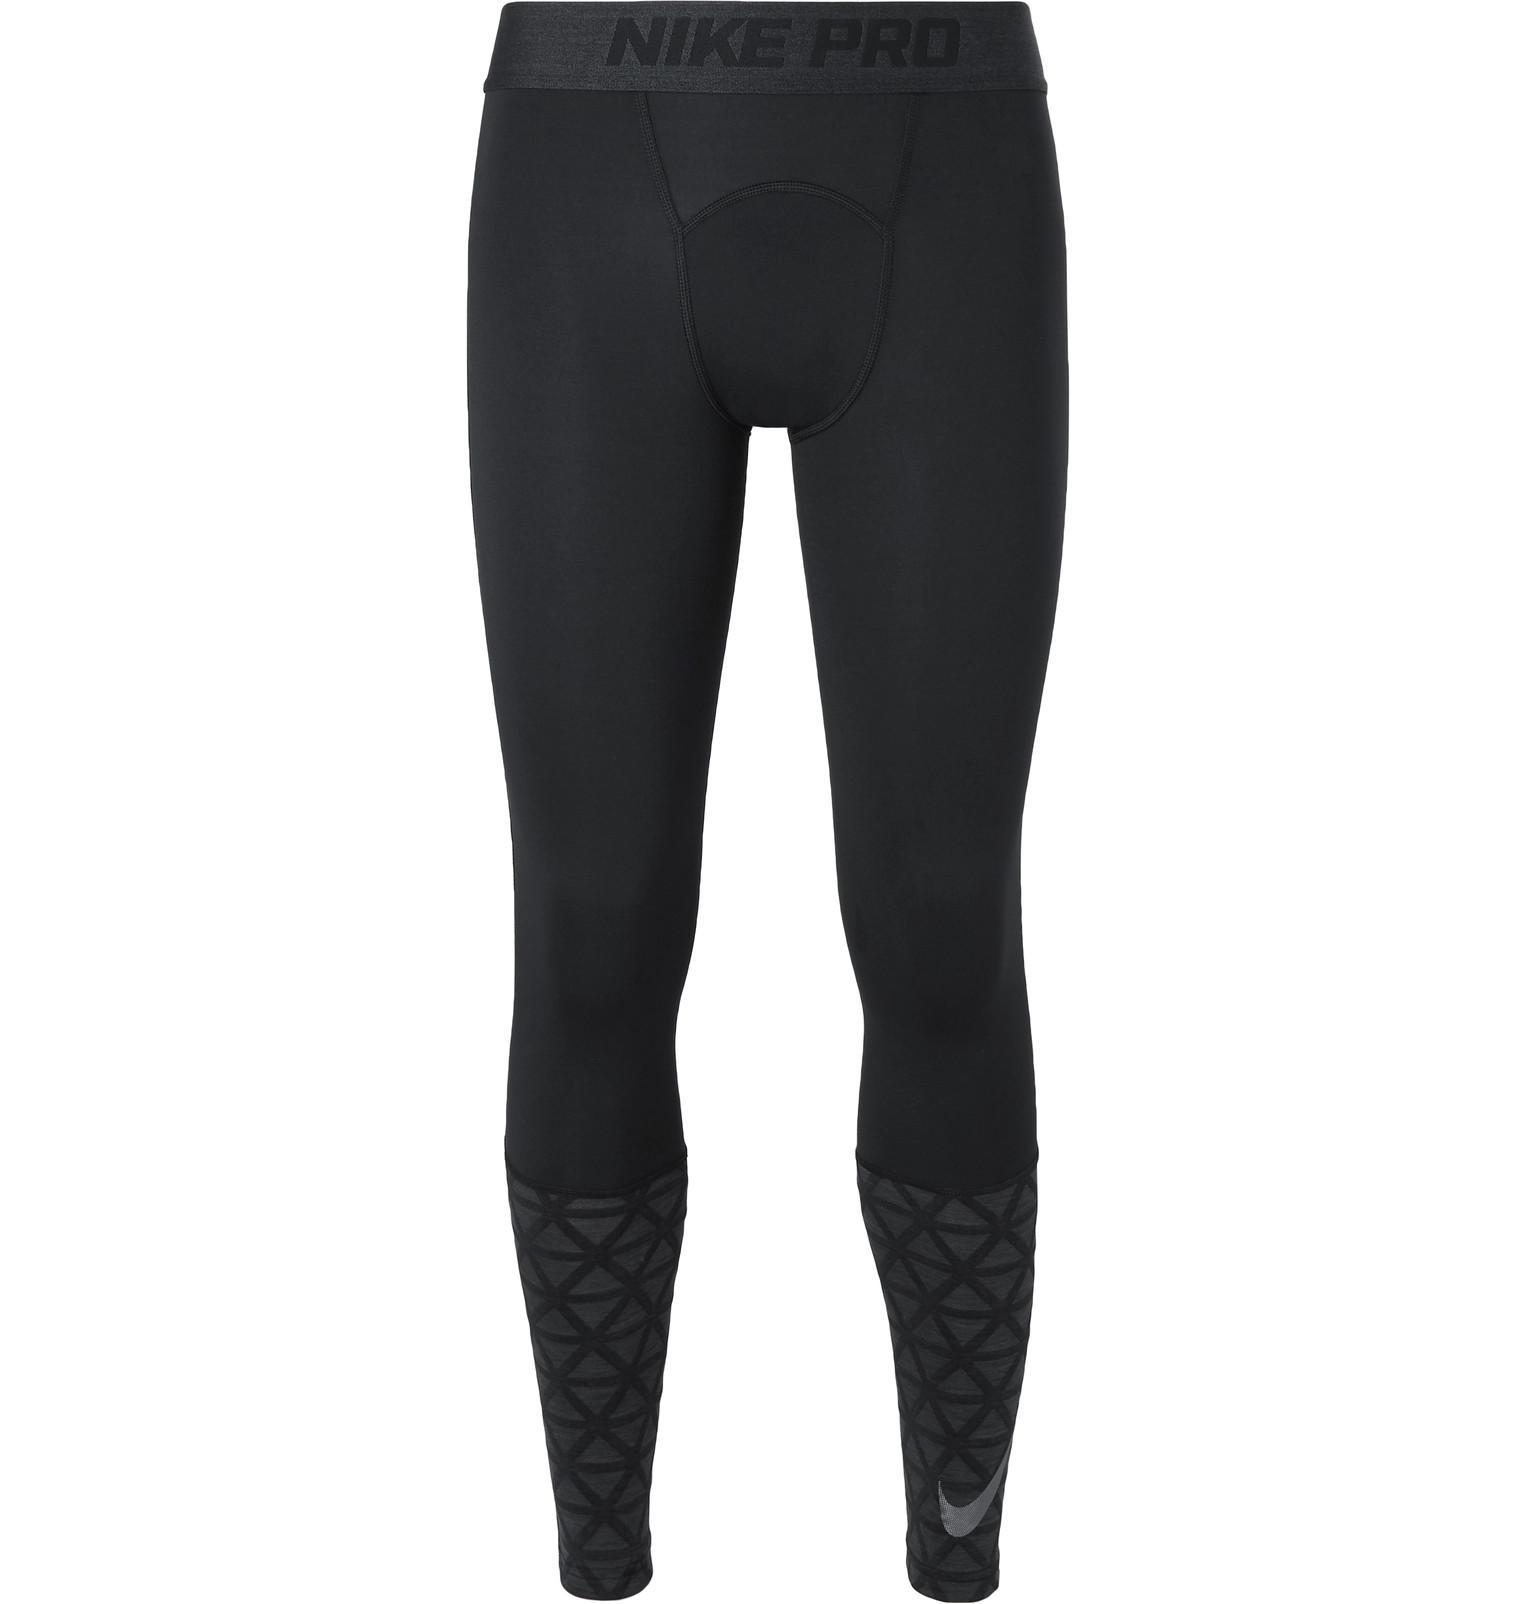 6cc0d74d7f42a Nike Pro Dri-fit Therma Tights in Black for Men - Lyst